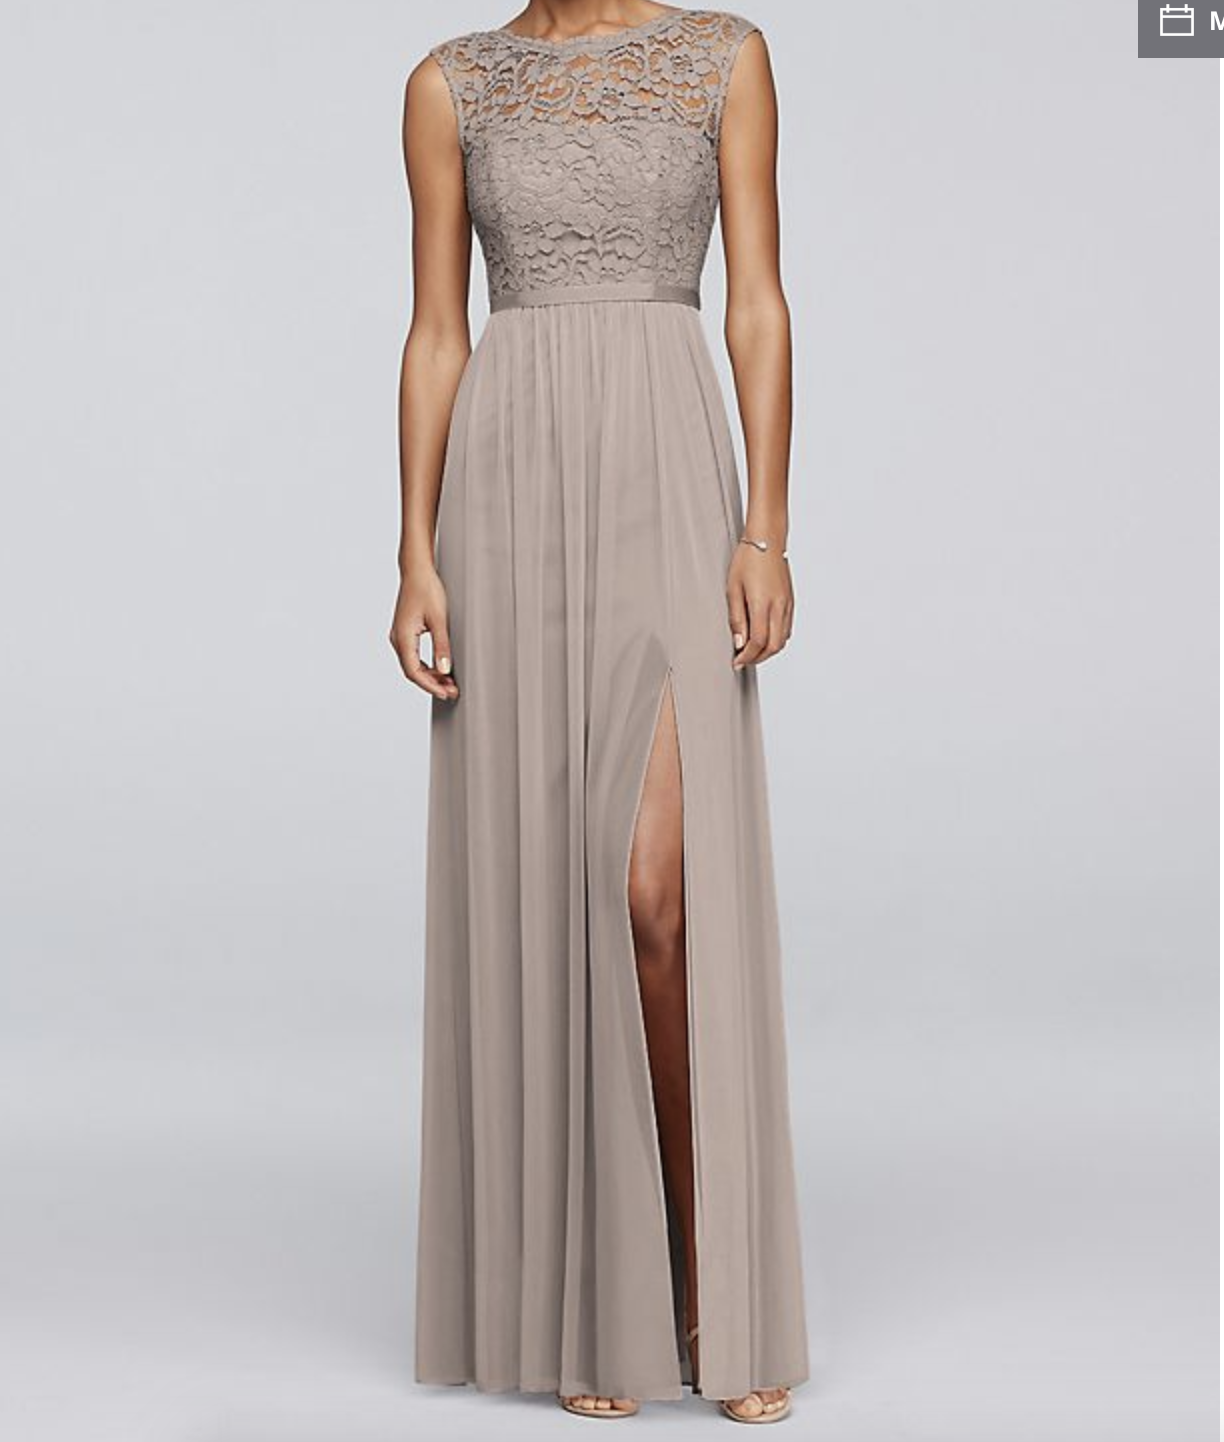 d2ae8e9162a Long Bridesmaid Dress With Lace Bodice Davids Bridal F19328 - Gomes ...